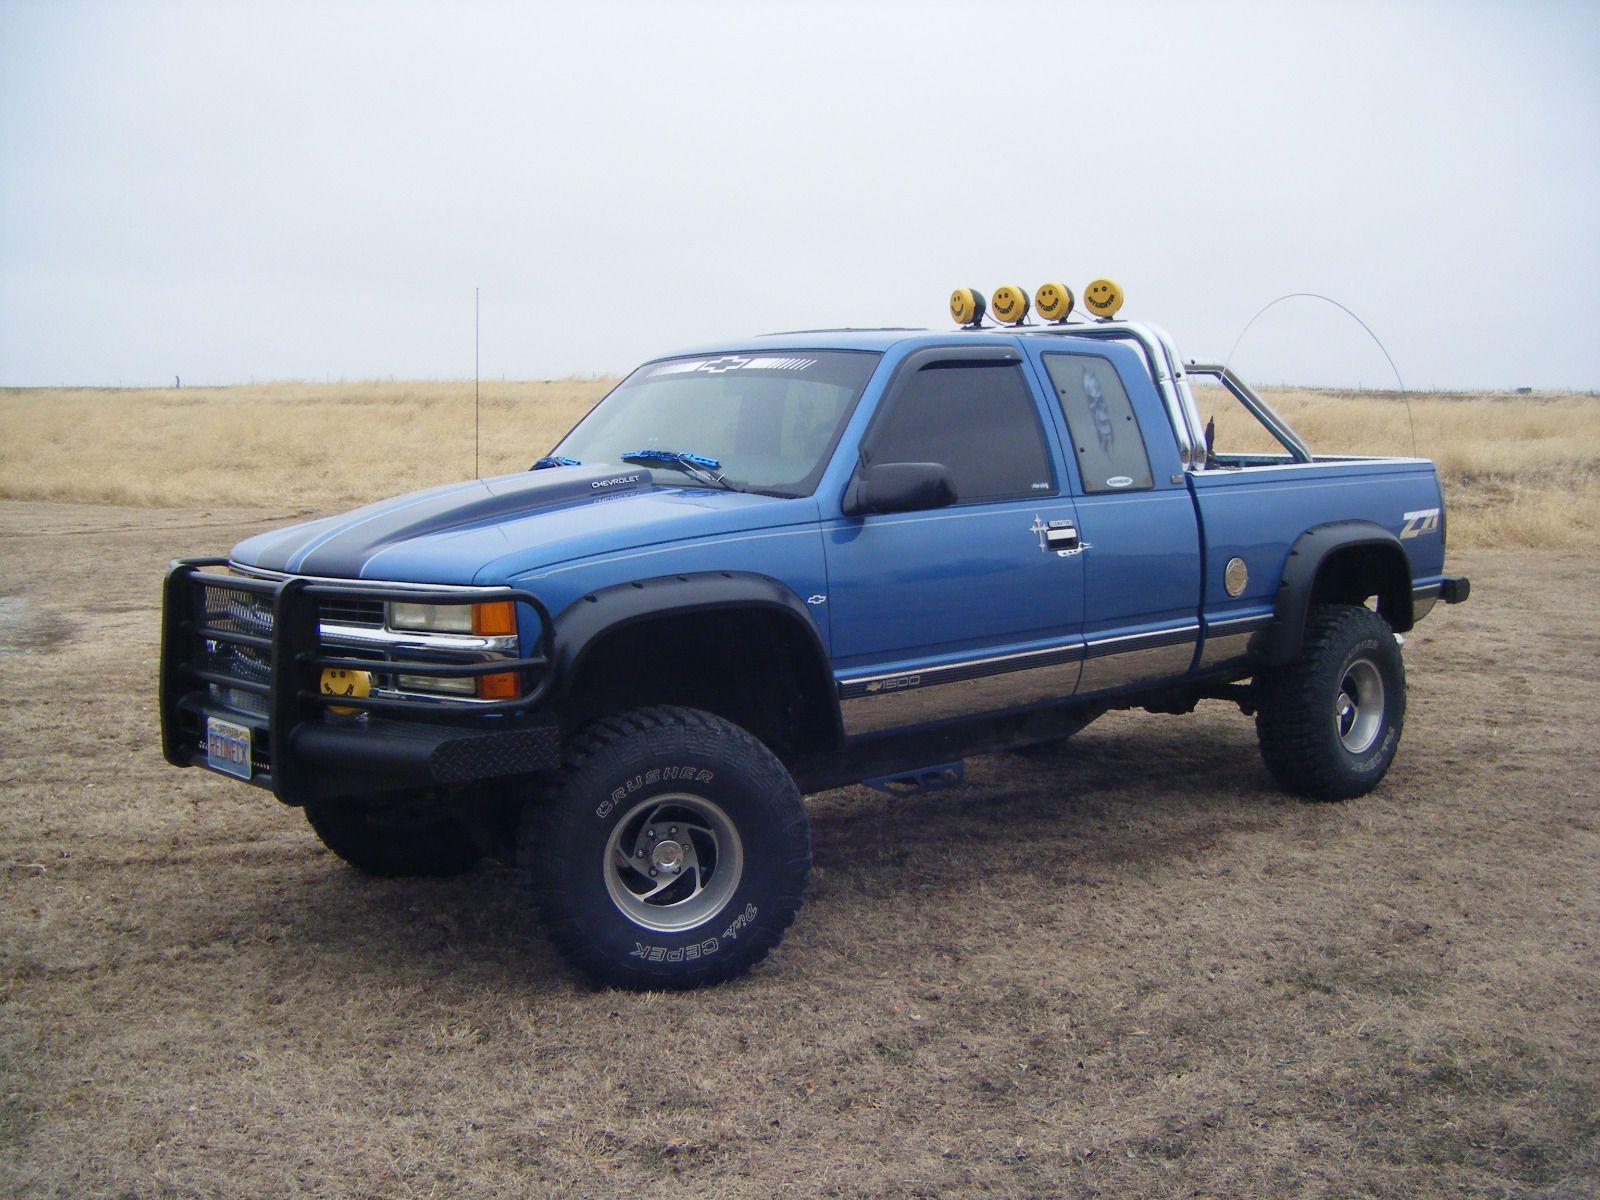 Rebuilt Engine 1995 Chevrolet Silverado 1500 Monster Truck With